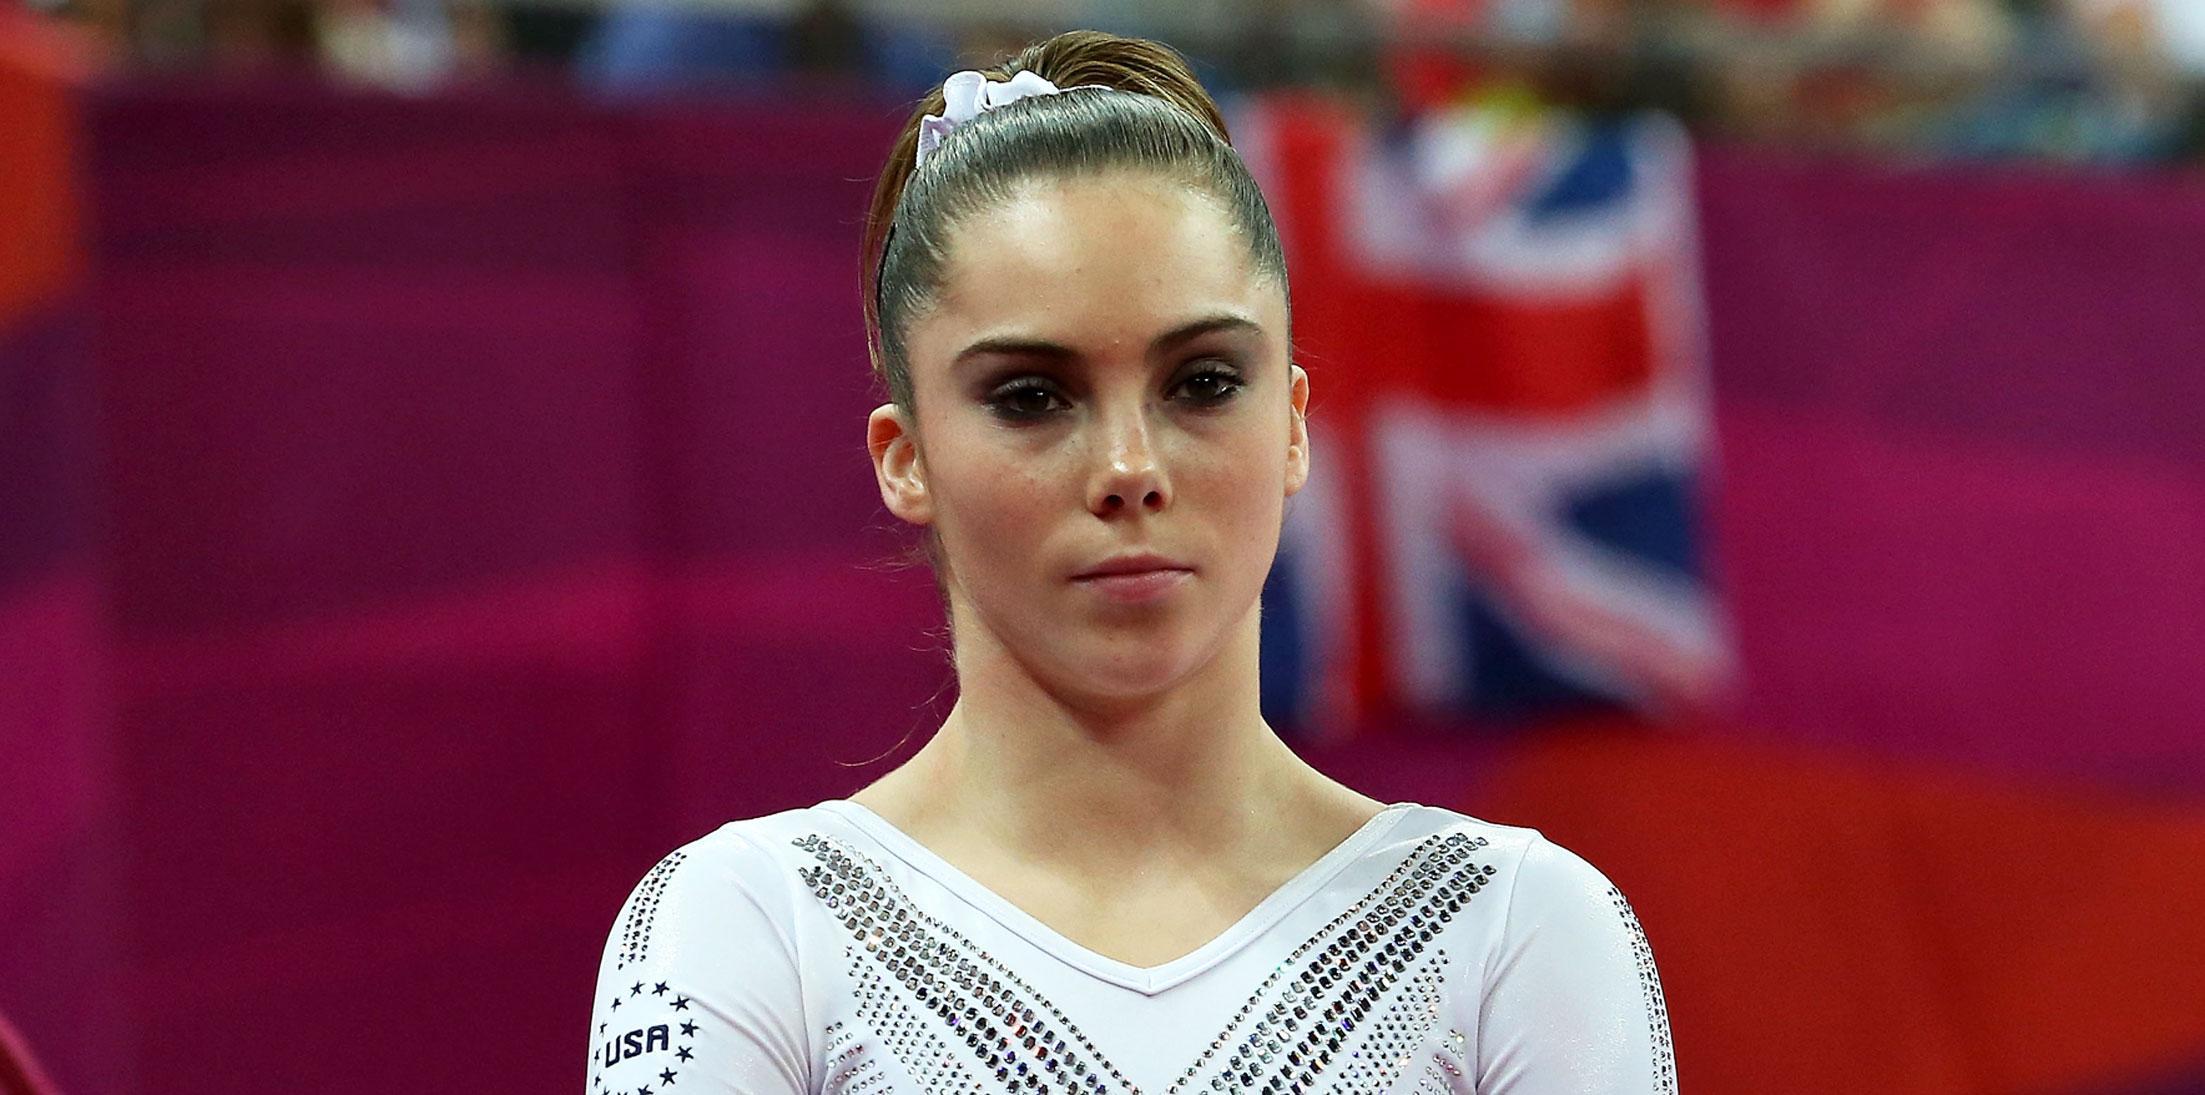 McKayla Maroney Claims USA Gymnastics Team Doctor Molested Her Long